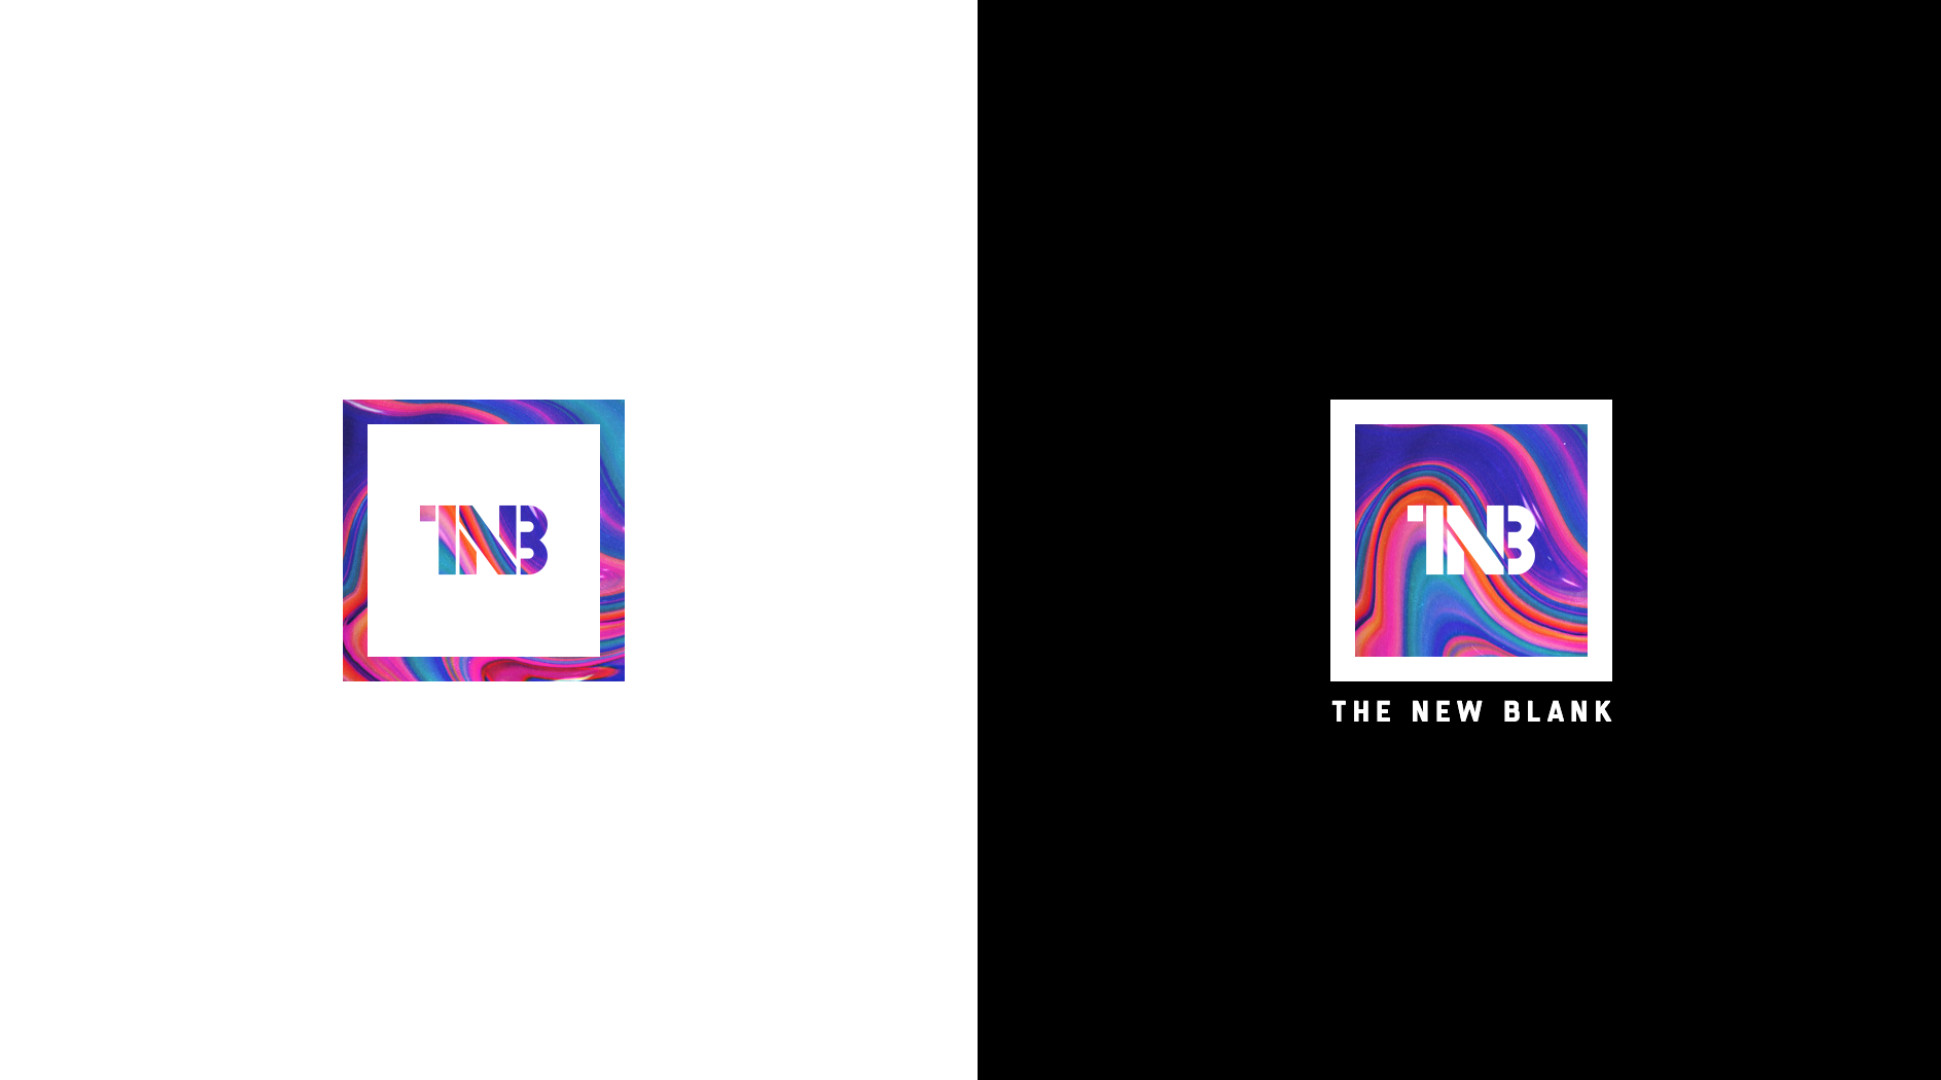 TNB_Brand_Refresh_Exploration_14